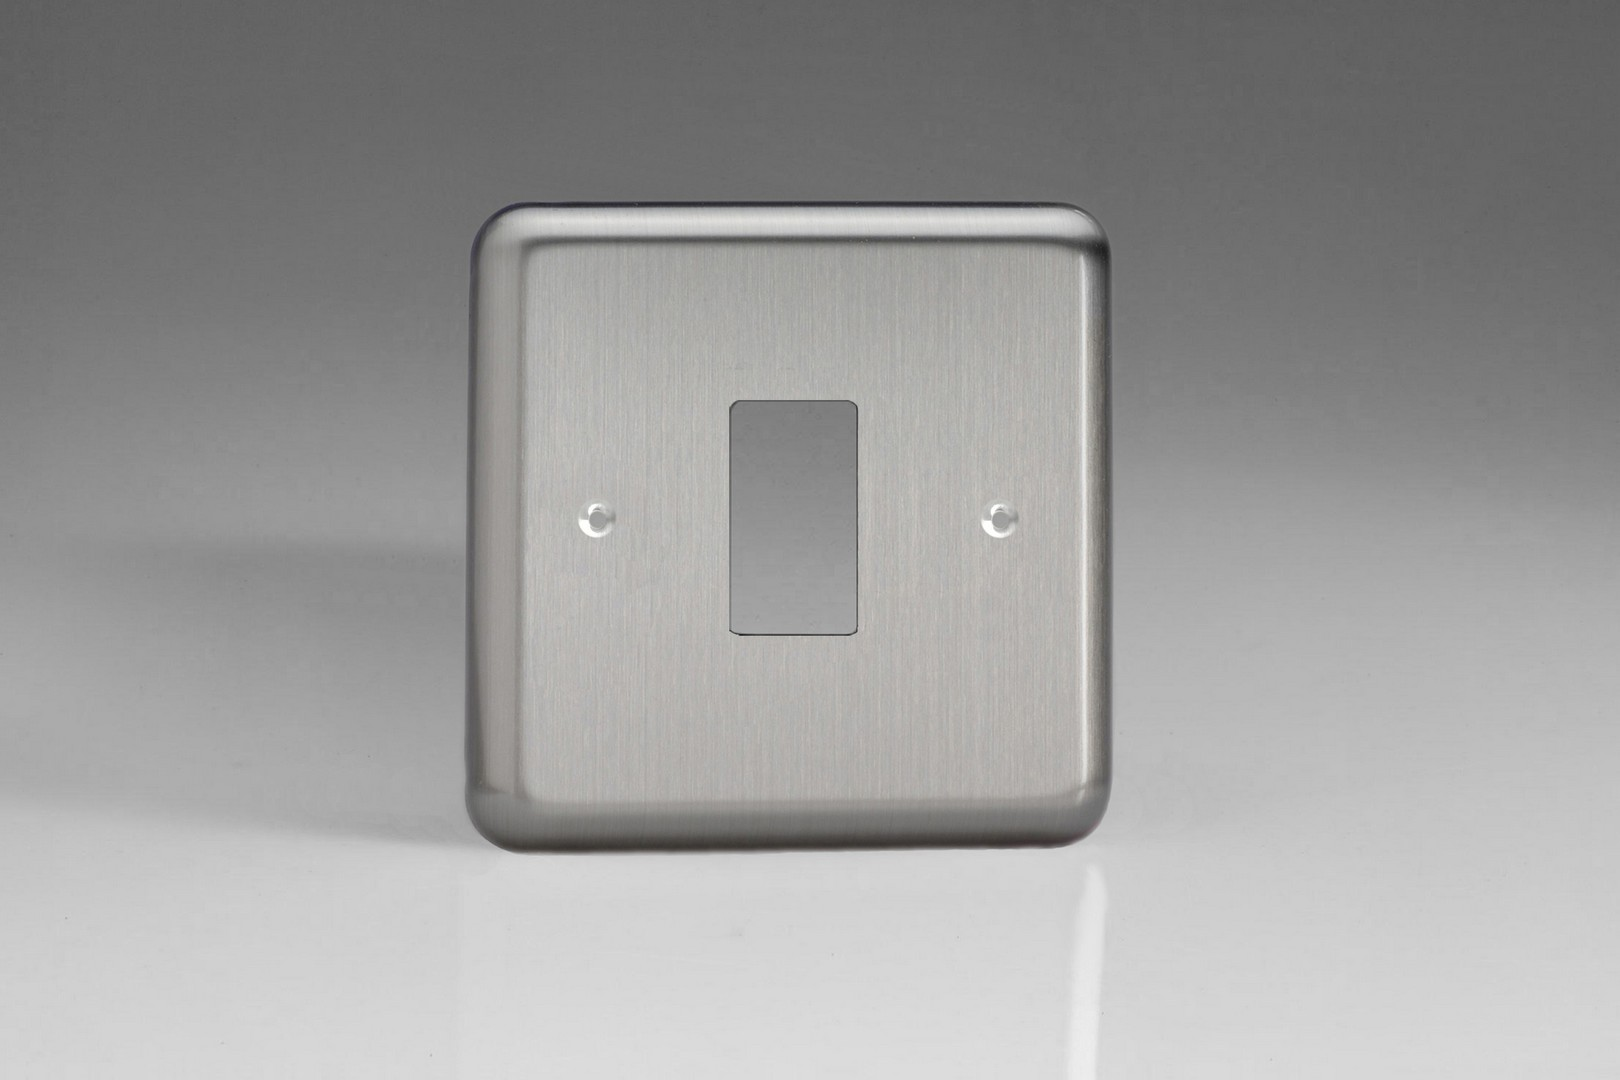 Switch Faceplate Classic Matt Chrome 1Gang Grid Plate Single Plate Faceplate